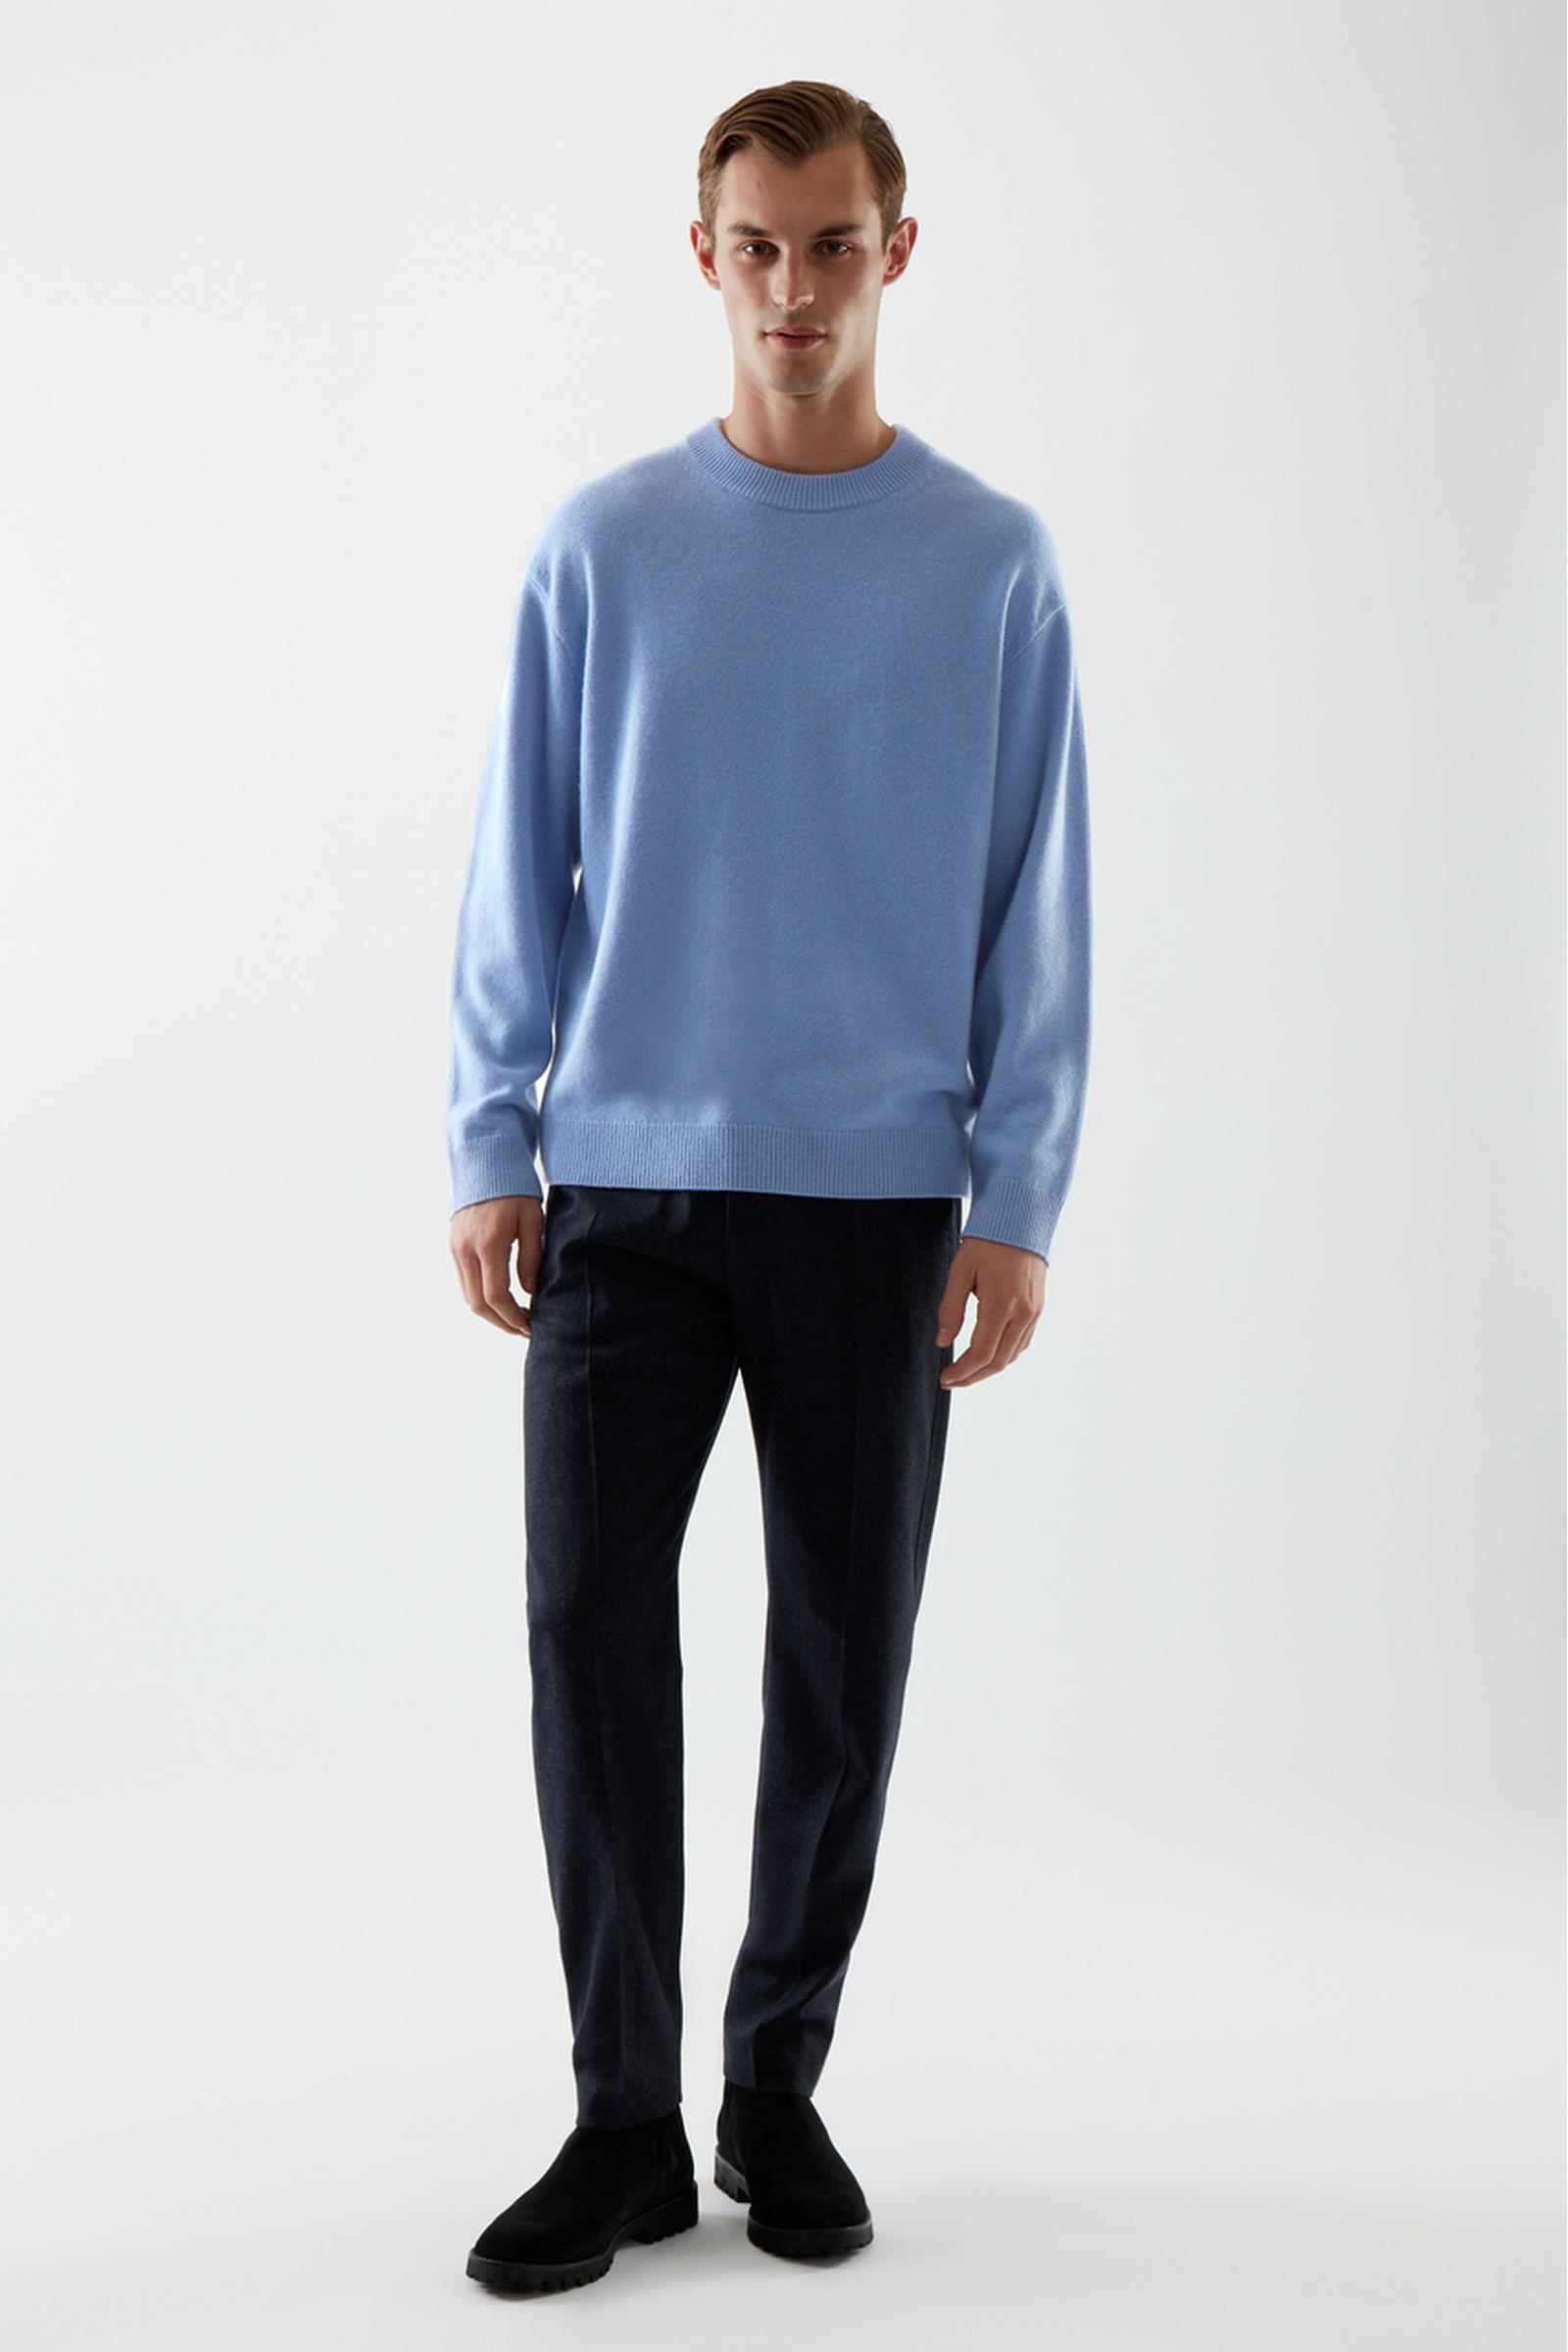 COS 캐시미어 오버사이즈 스웨터의 블루컬러 ECOMLook입니다.